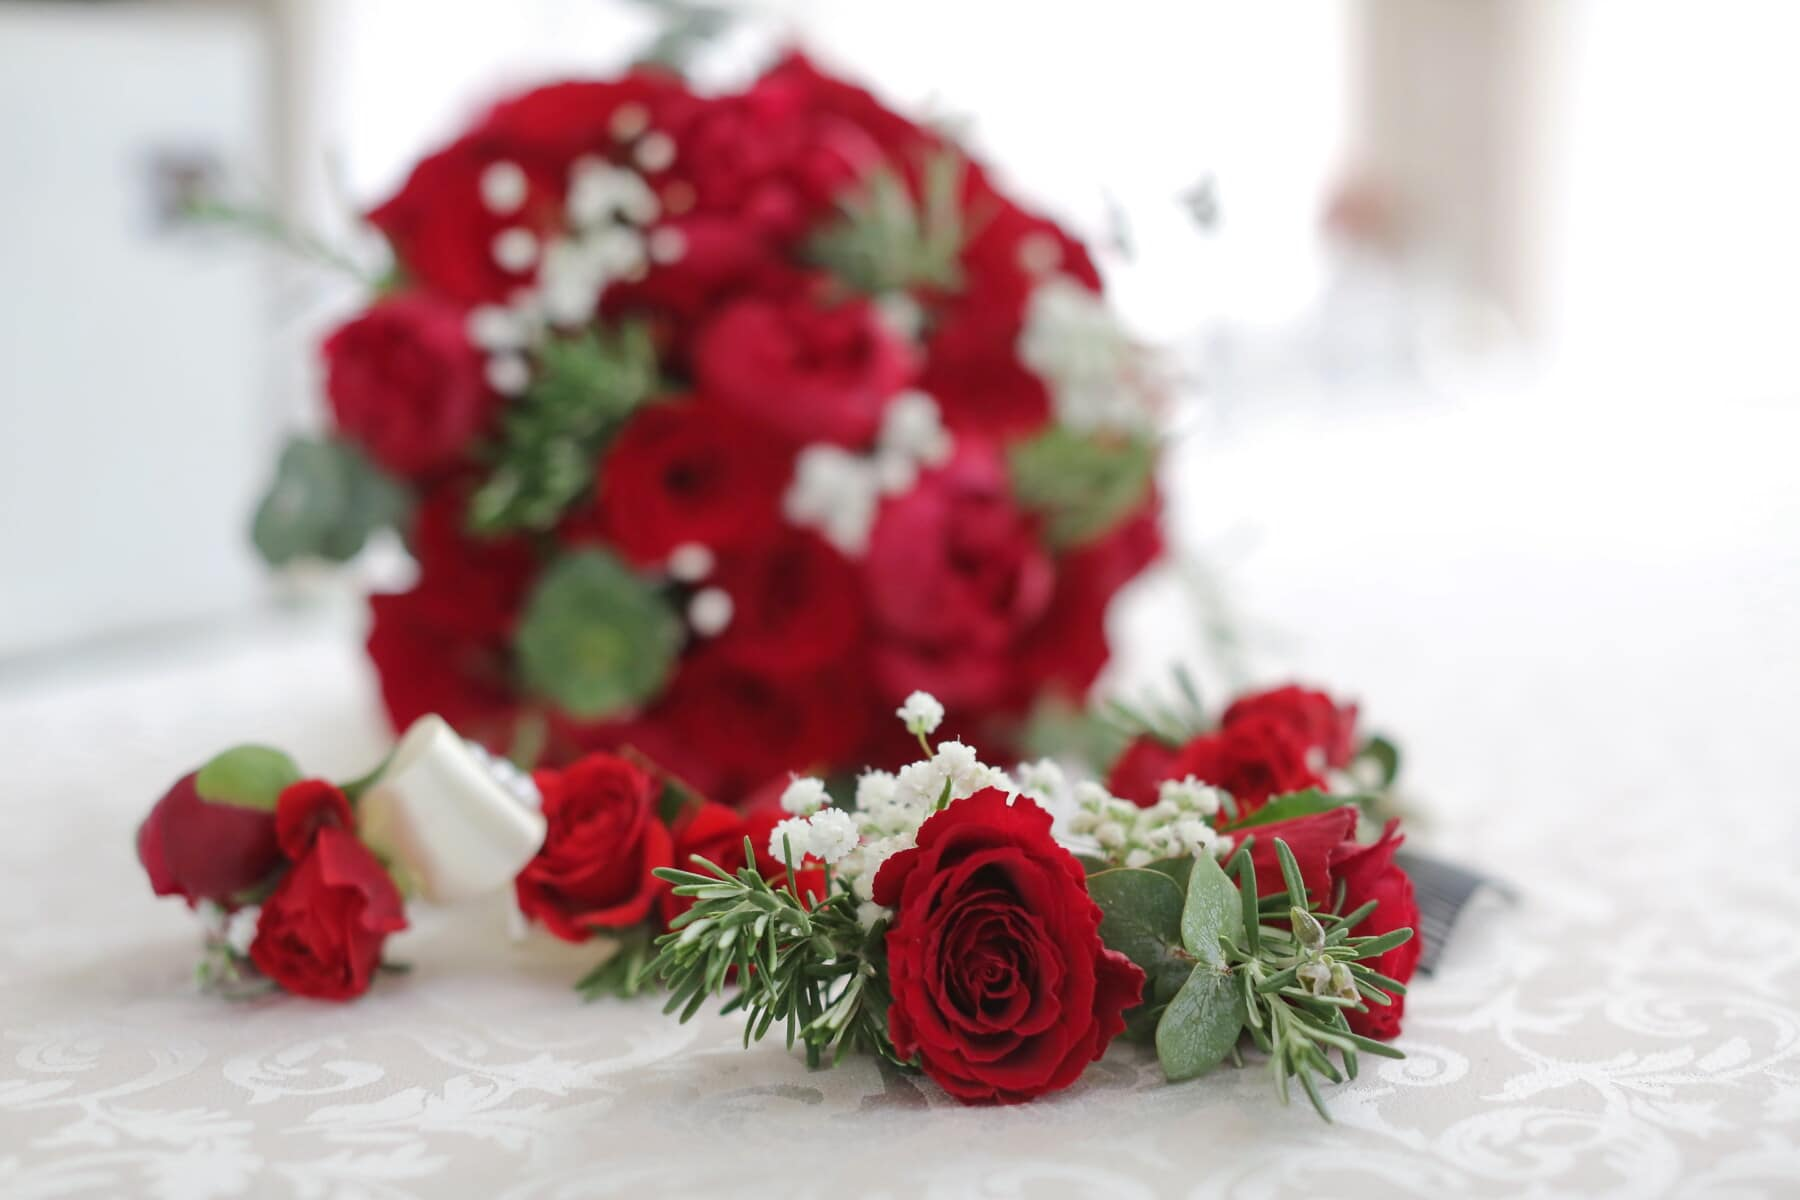 bouquet, roses, wedding bouquet, red, bedroom, bed, rose, decoration, arrangement, love